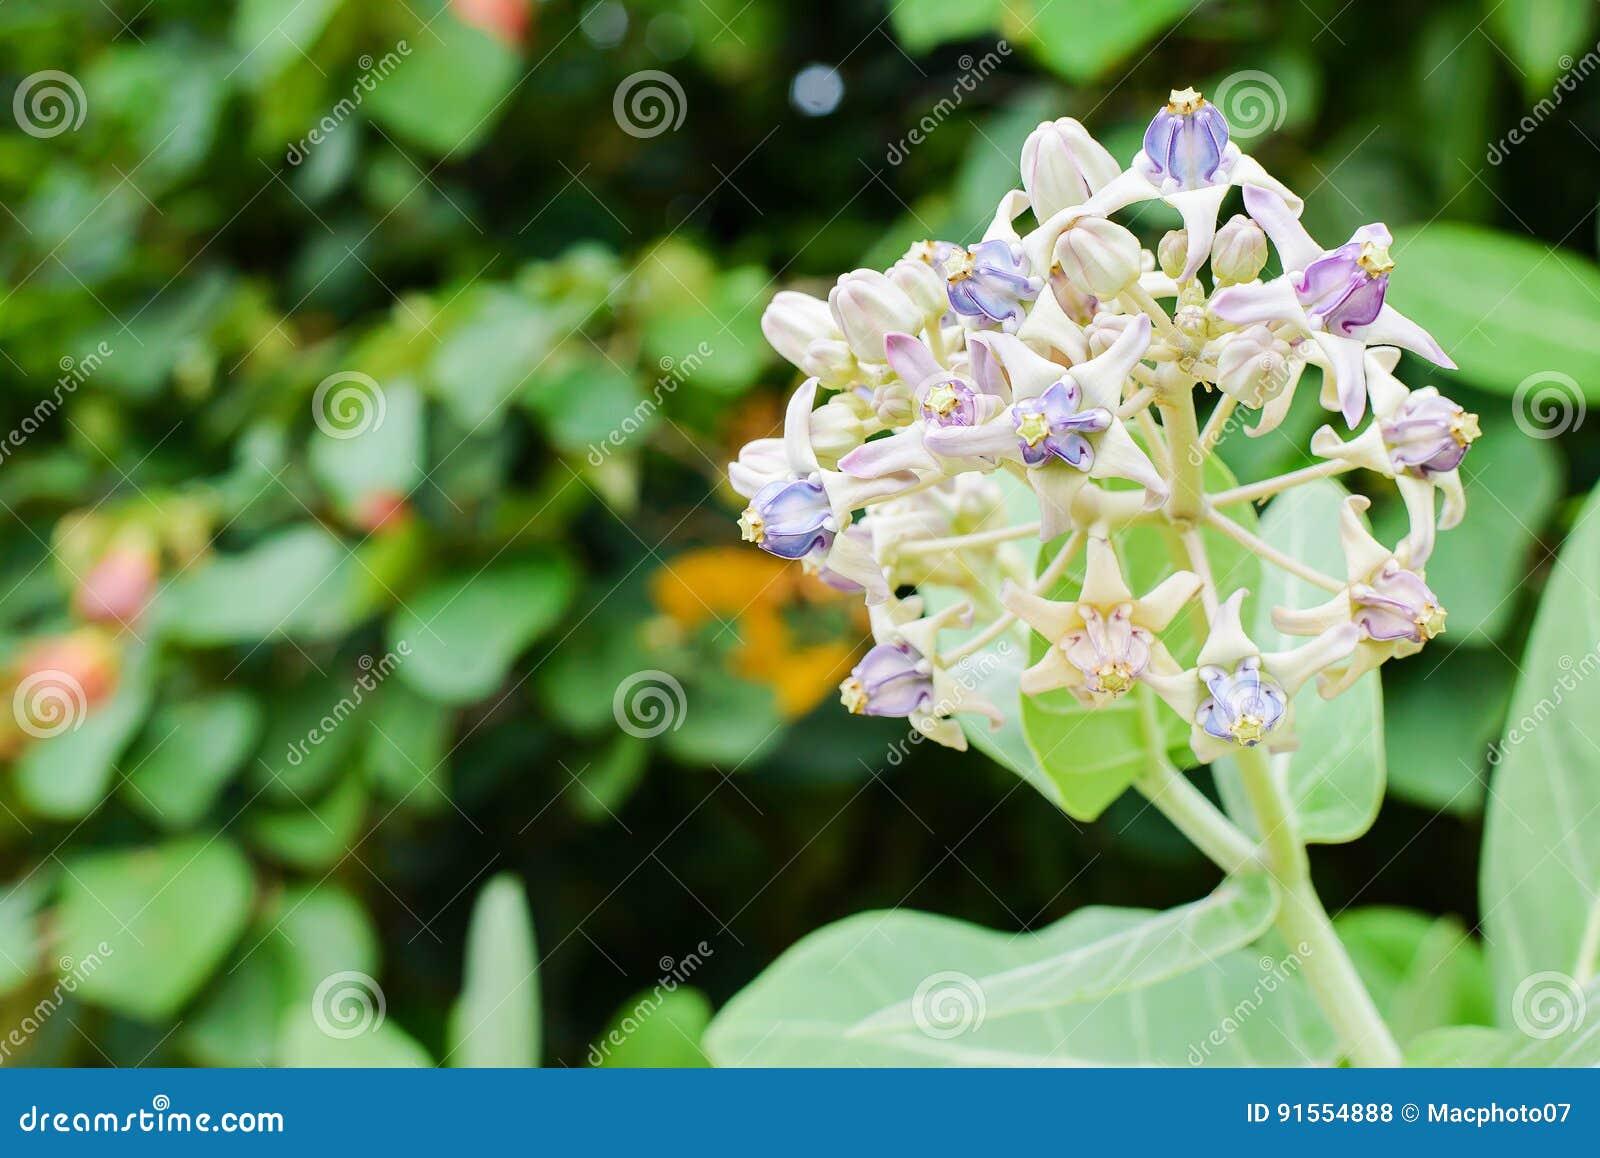 Purple Crown Flower Blooming On The Tree Calotropis Gigantea Stock